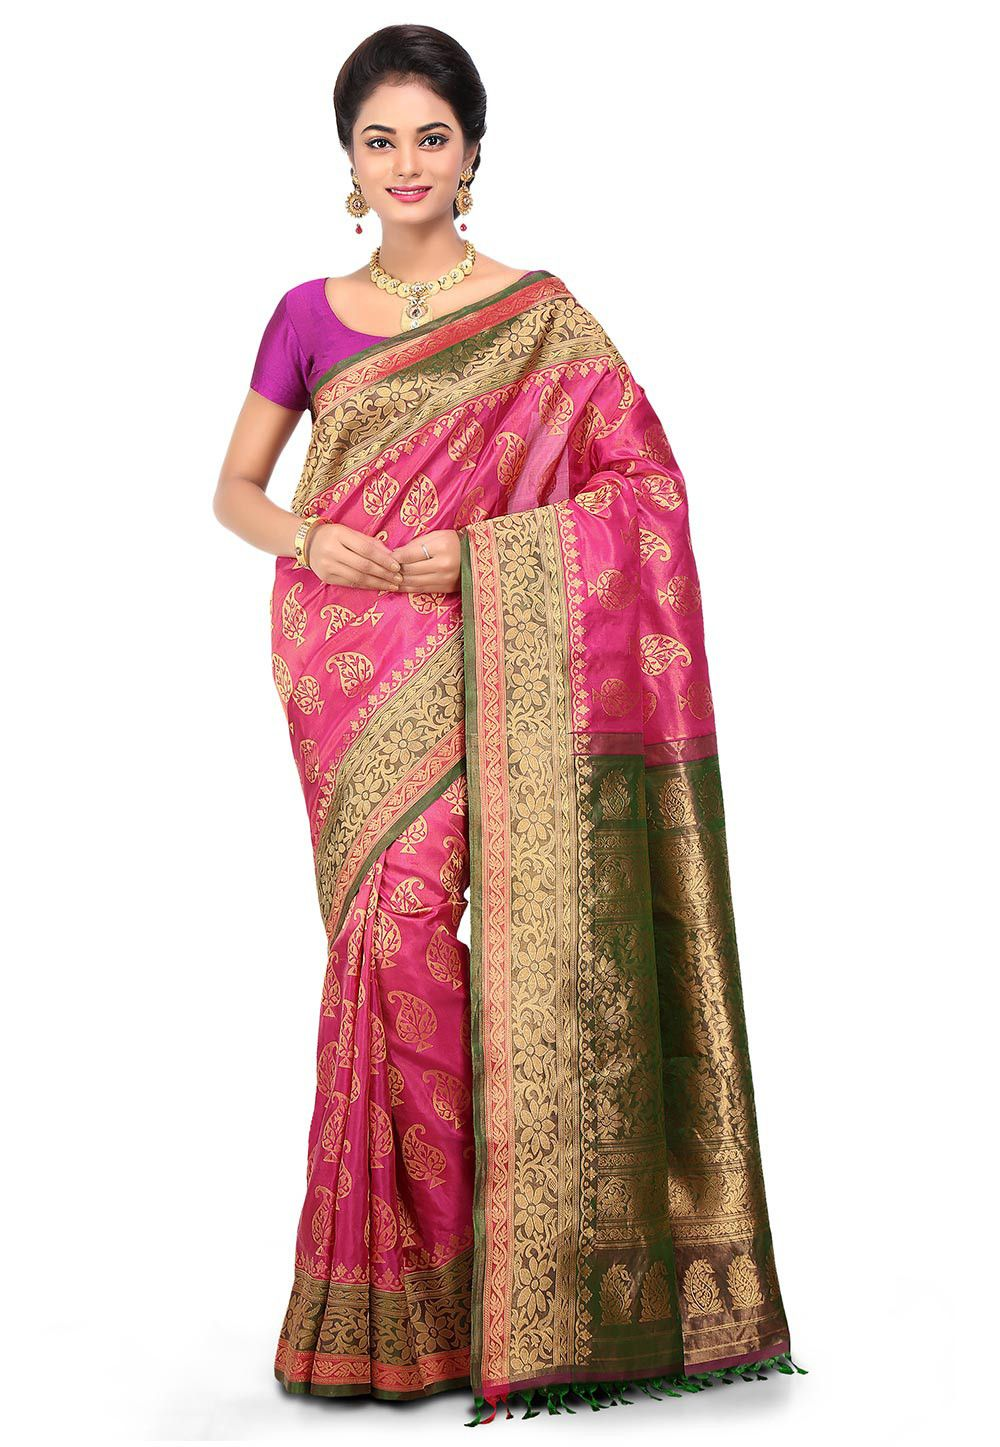 Engagement pattu saree images handloom pure gadwal silk saree in fuchsia  things to wearsarees